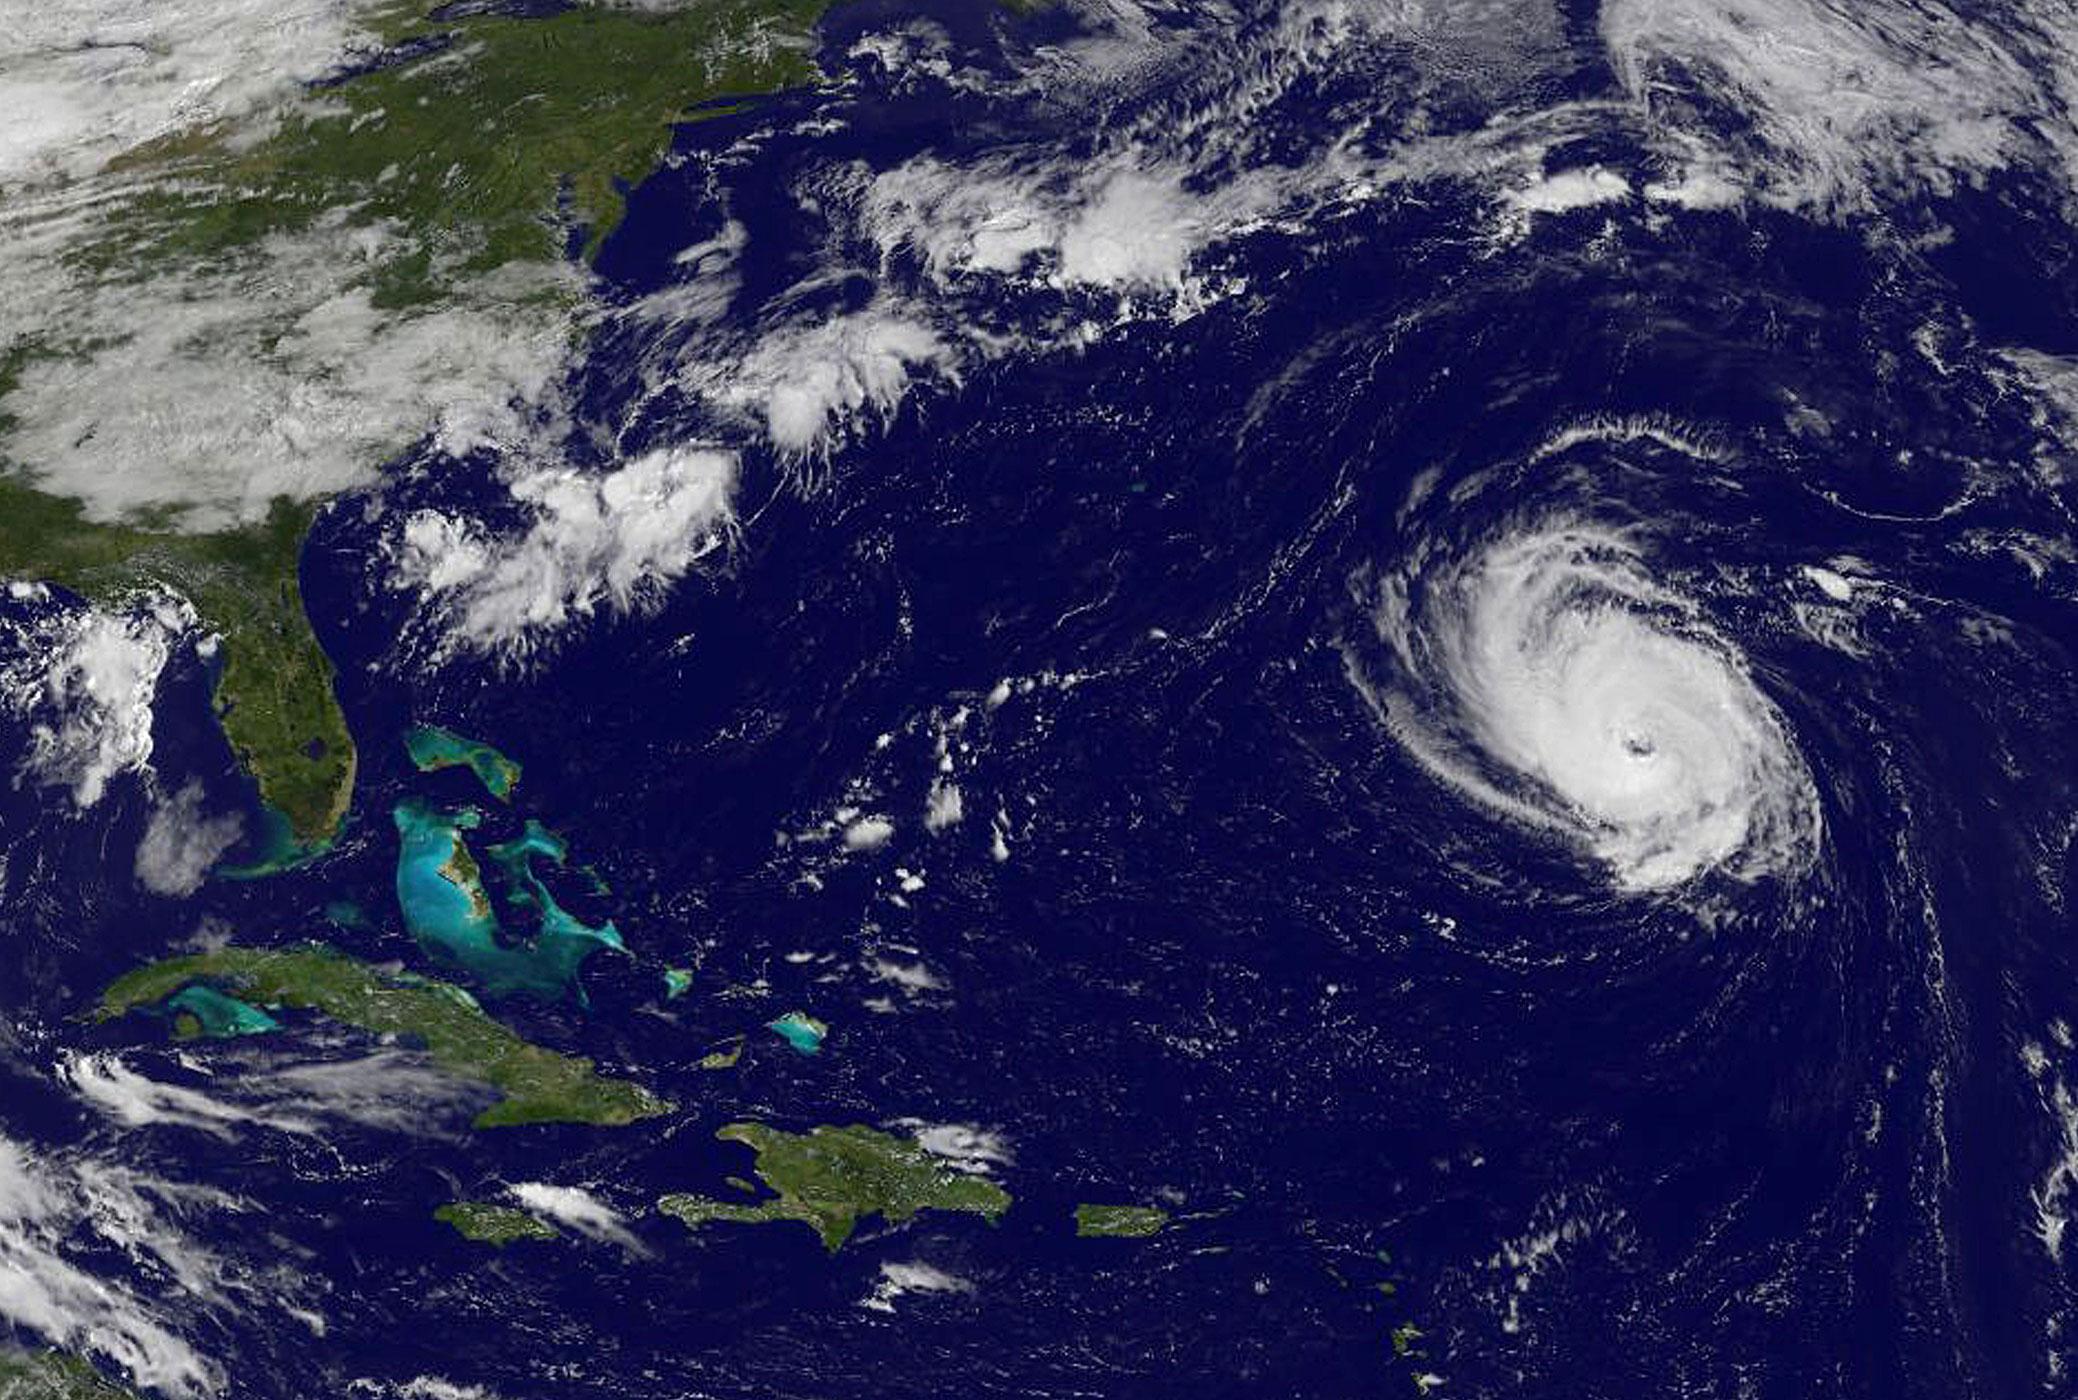 Hurricane Edouard seen in the Atlantic Ocean.